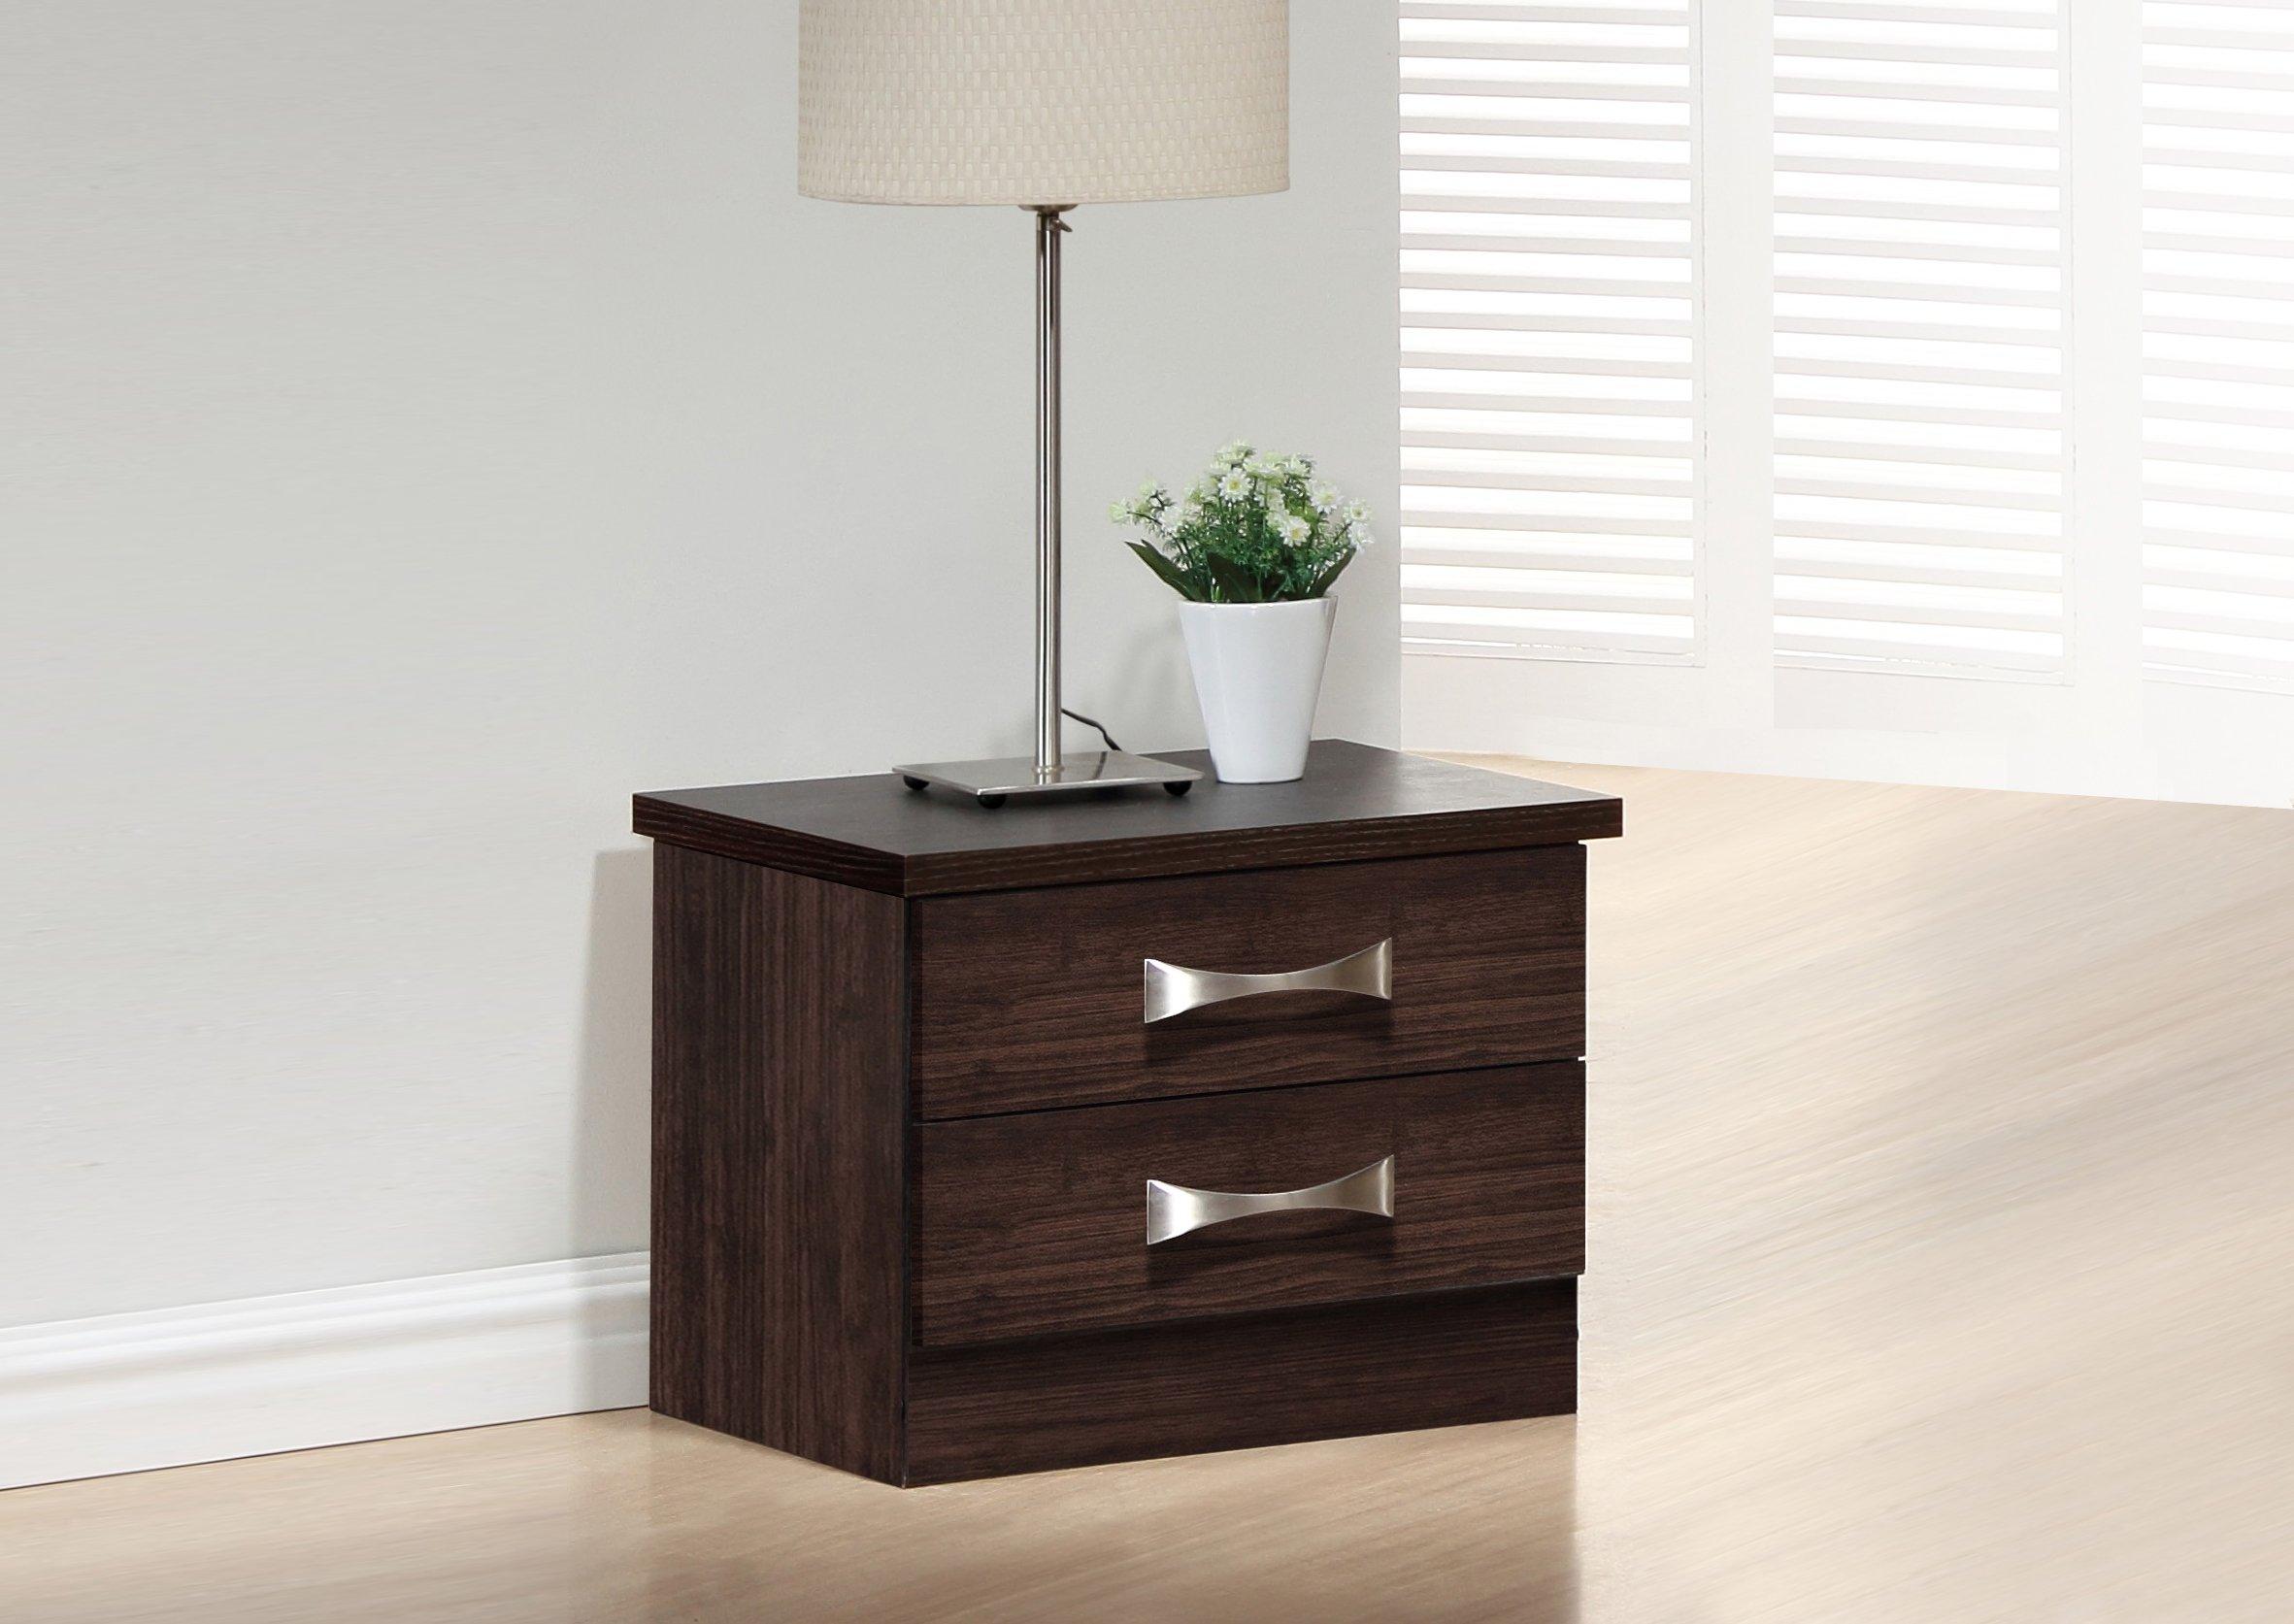 Baxton Studio Wholesale Interiors Colburn 2 Drawer Finish Wood Storage Nightstand Bedside Table, Medium, Dark Brown